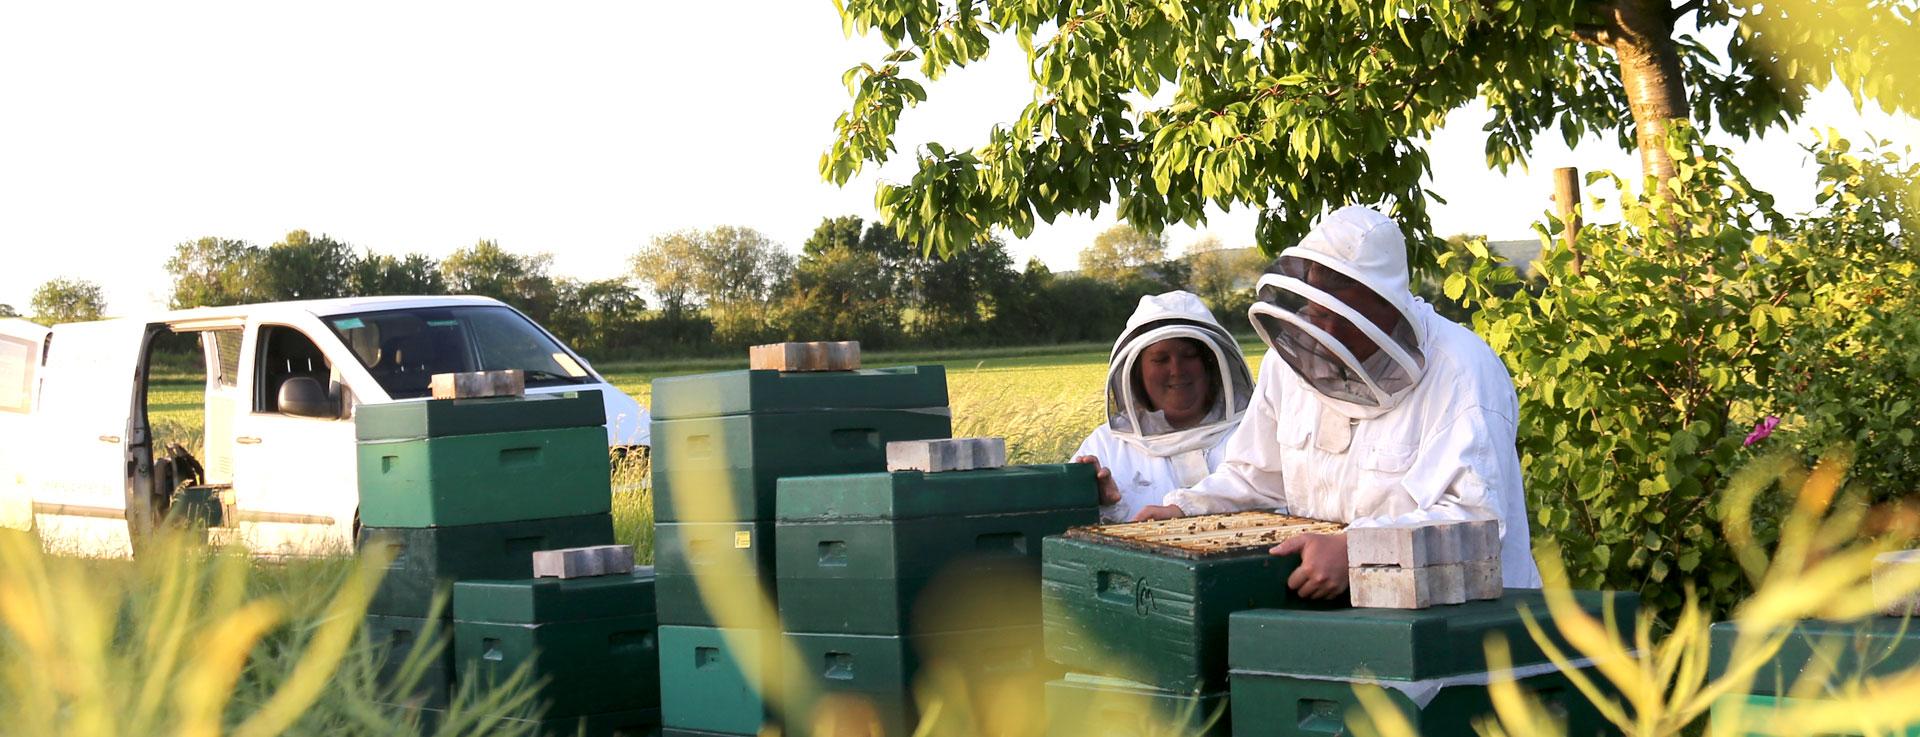 Honigernte im Rapsfeld